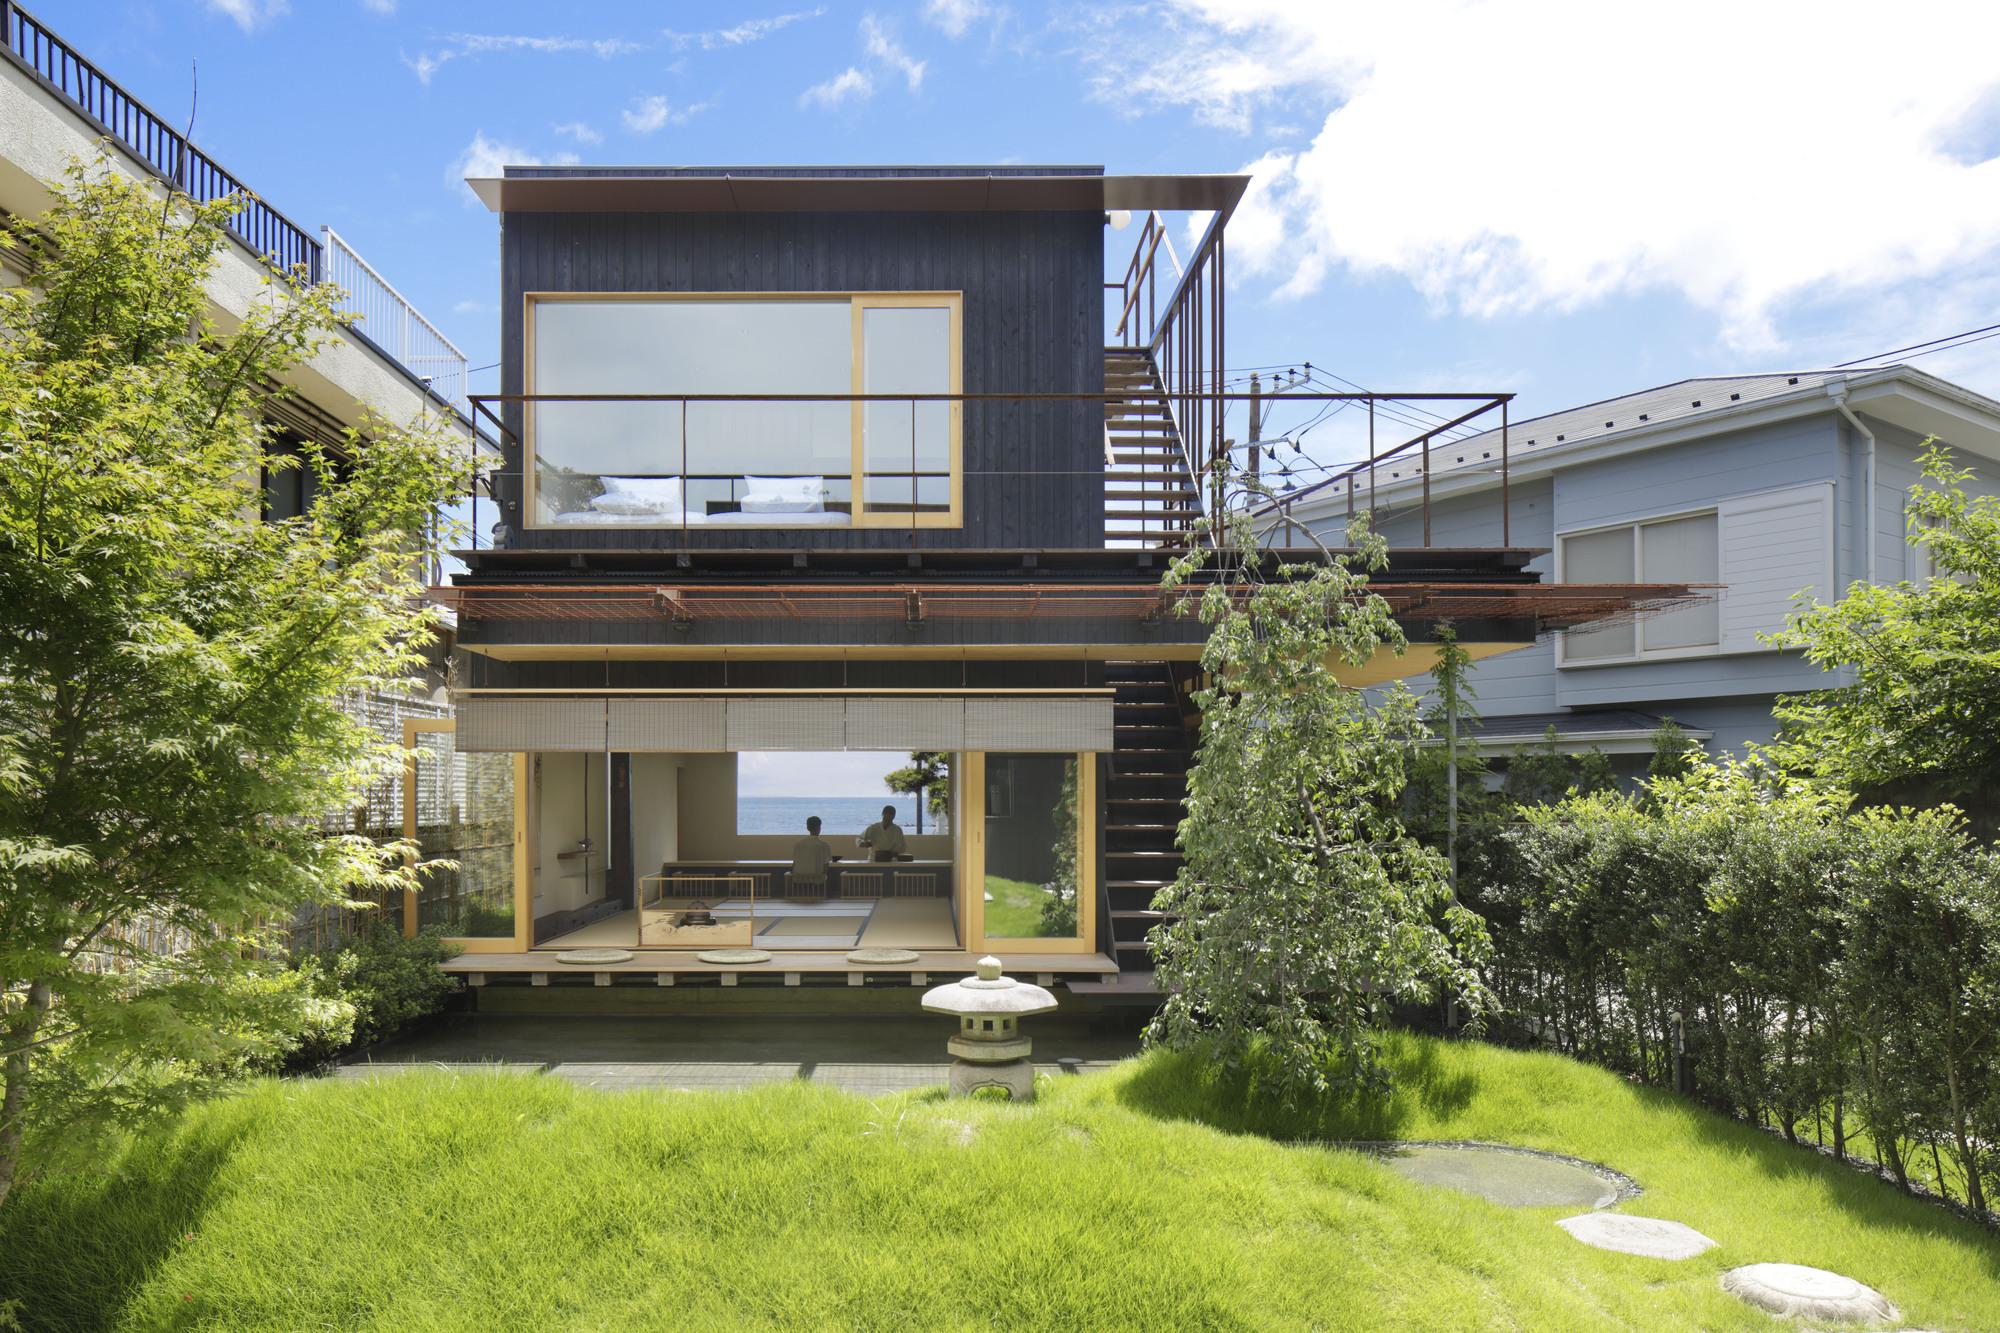 Modern Ryokan Kishi-ke Guest House / G architects studio